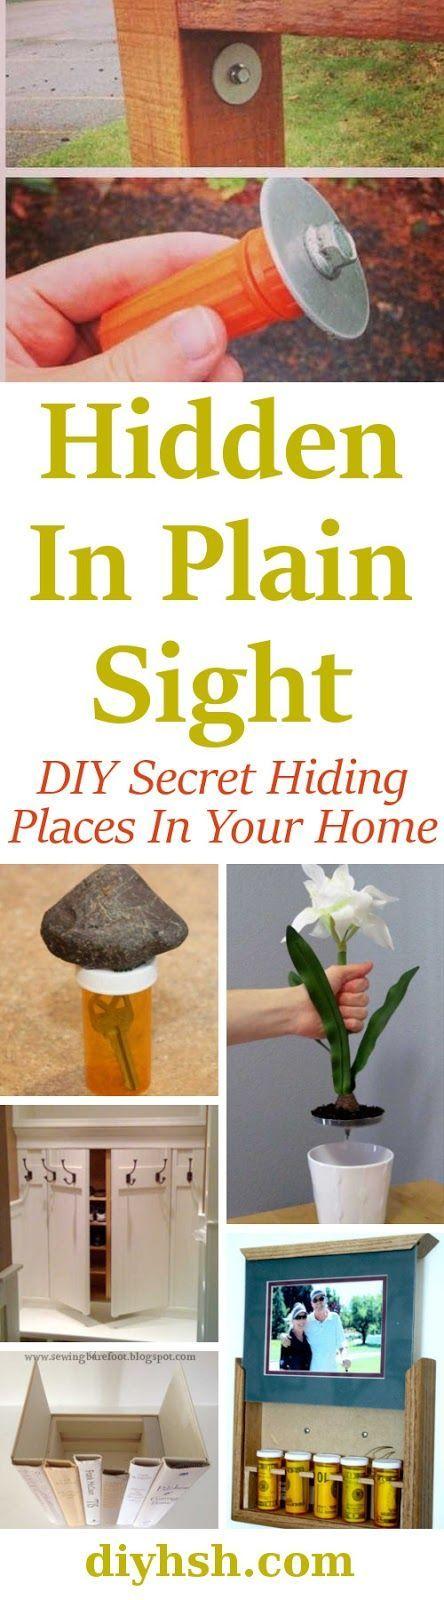 Hiding In Plain Sight - DIY Secret Hiding Places In Your Home #Storage #DIY DIYHSH #HiddenStorage #SecretHiding